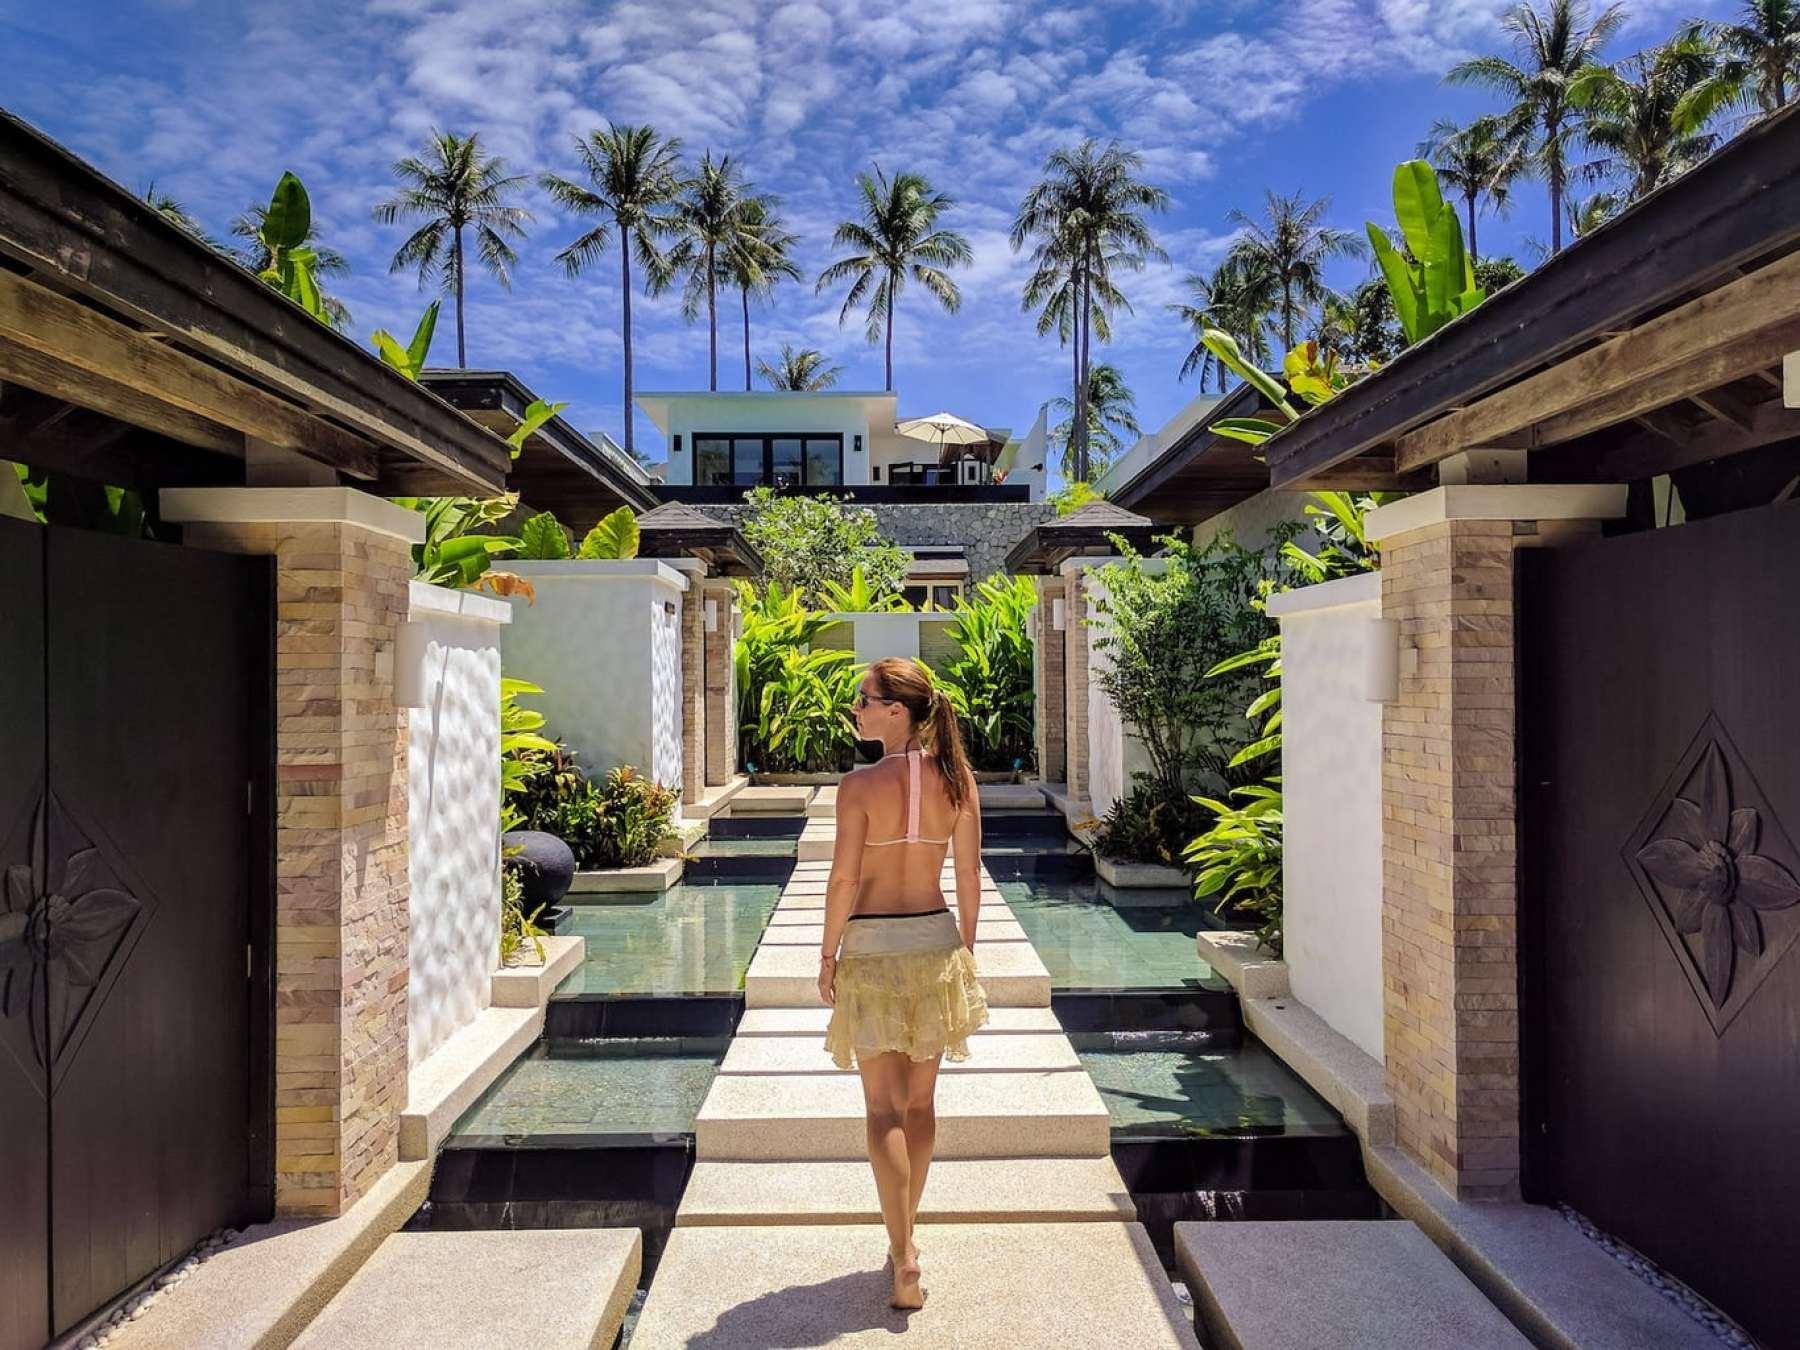 Walking among the luxurious villas